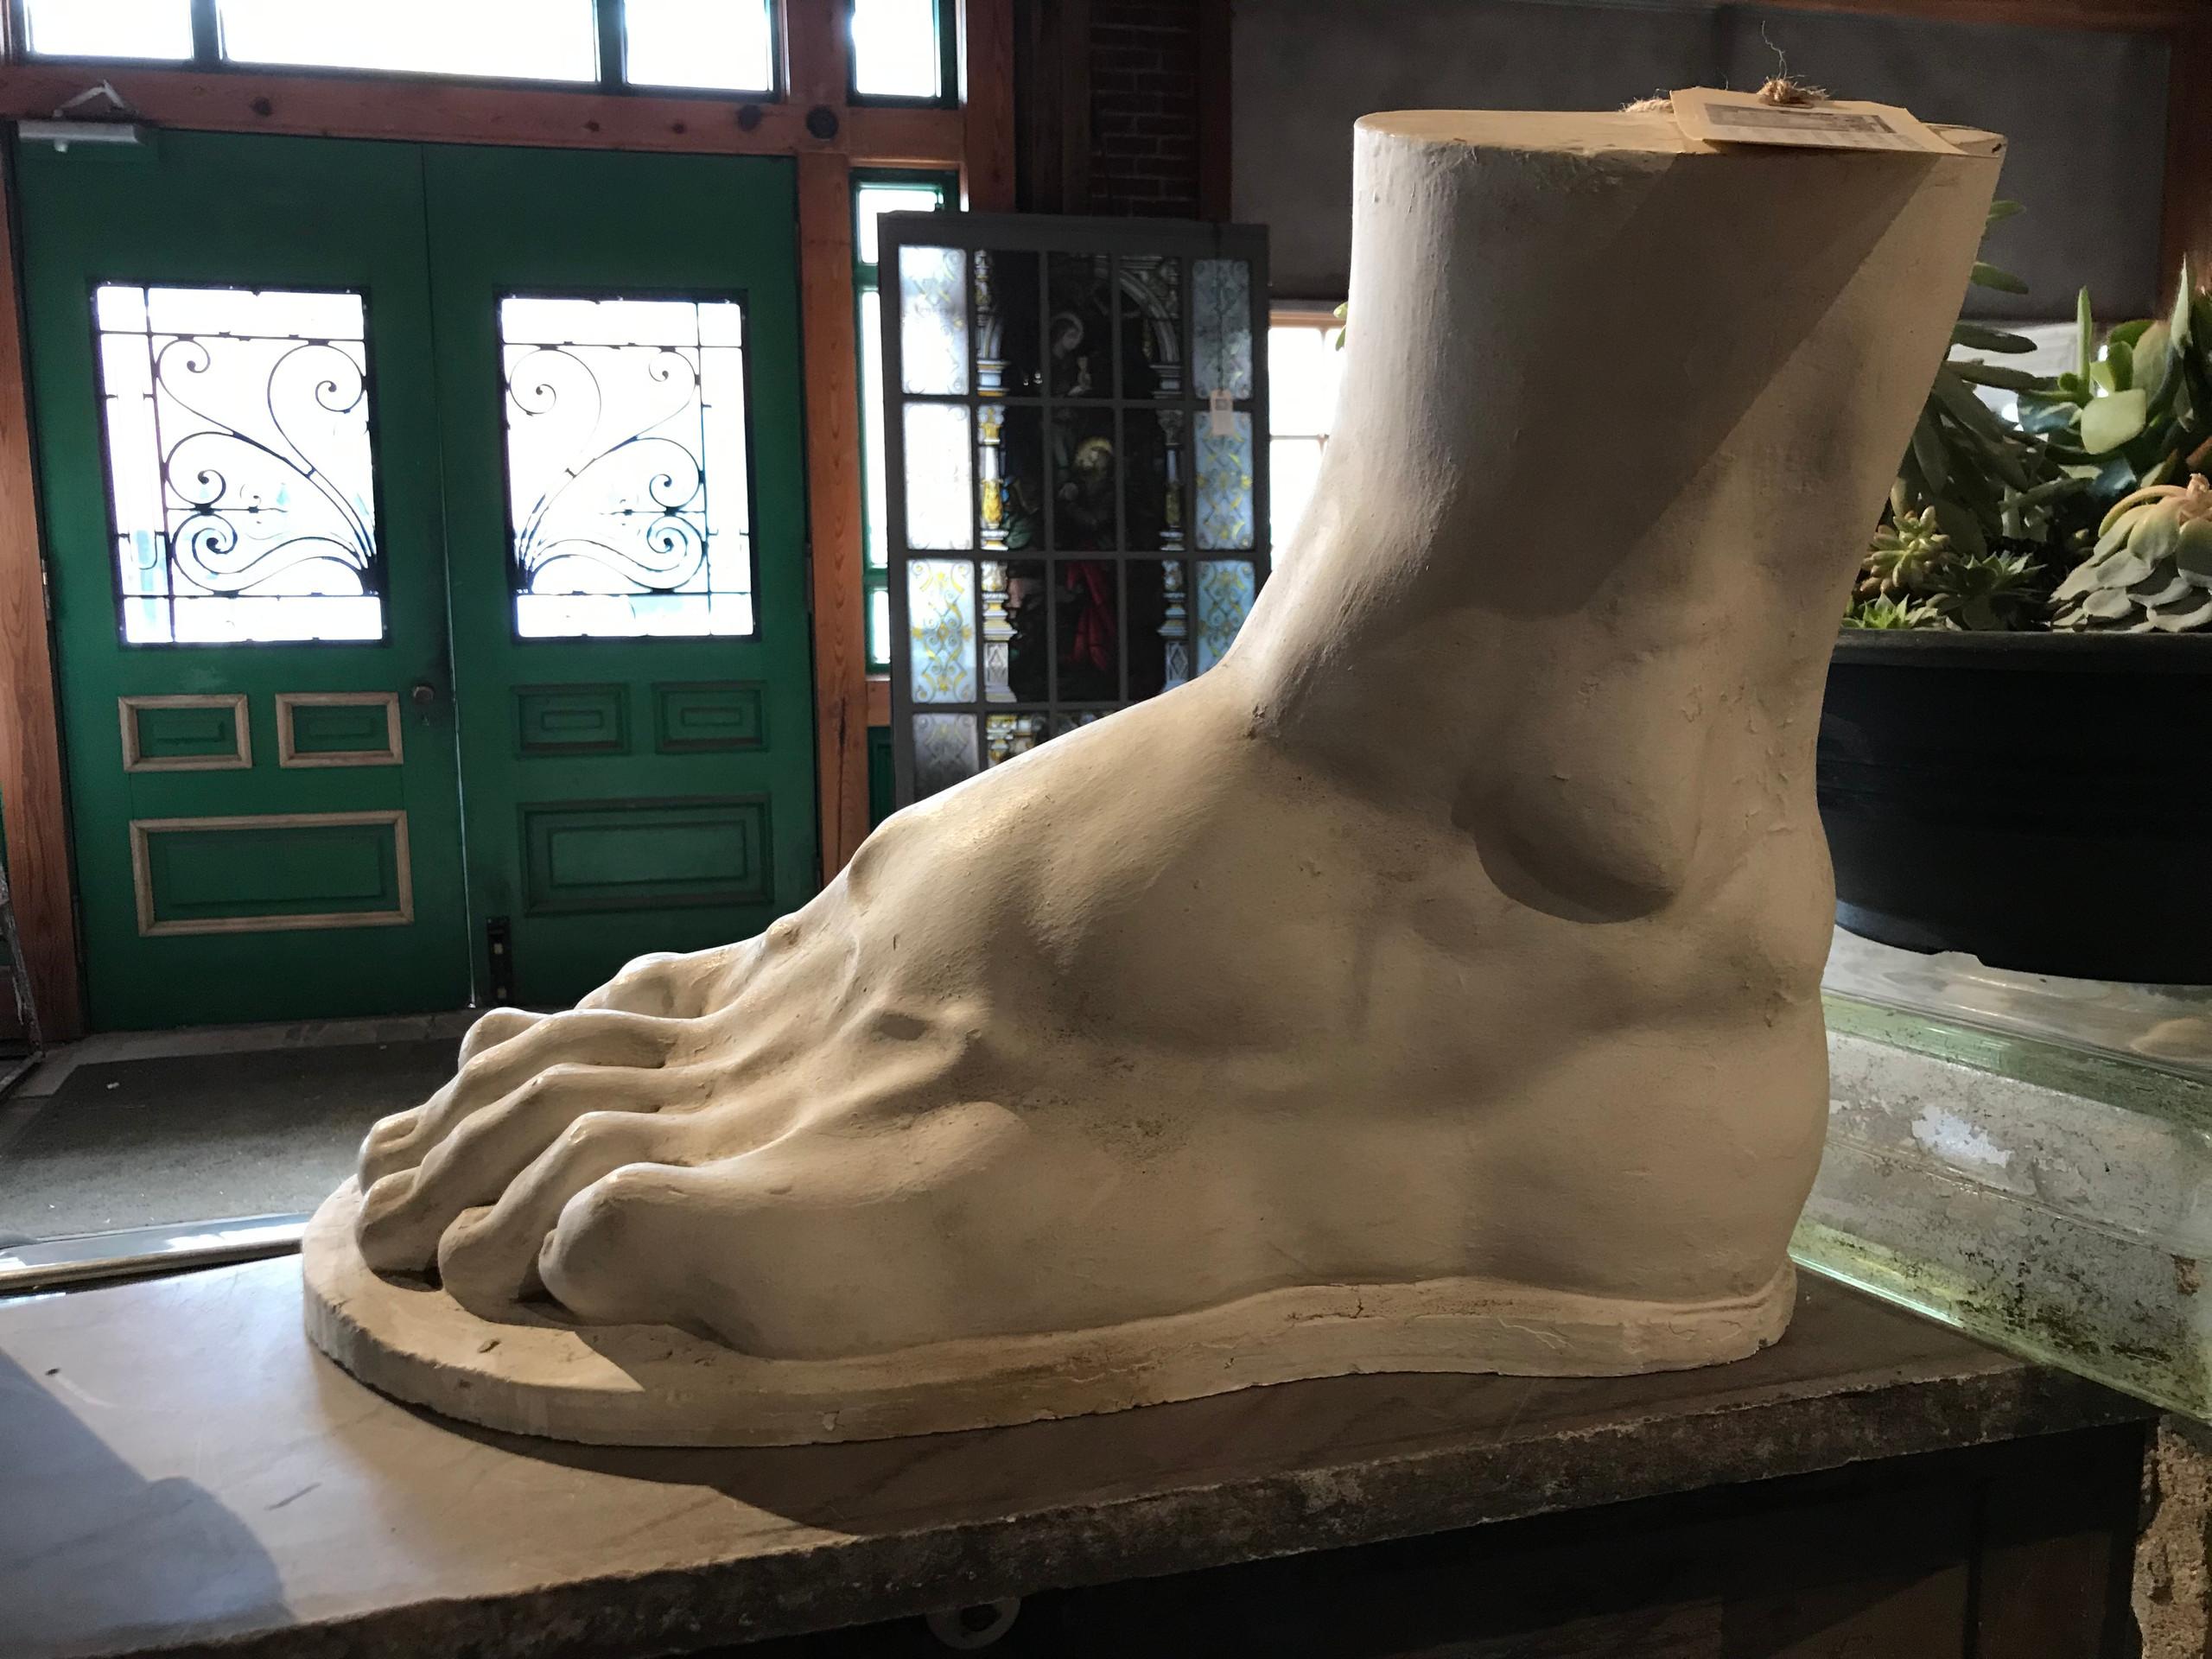 Replica of David's foot, by Bob Cassily.